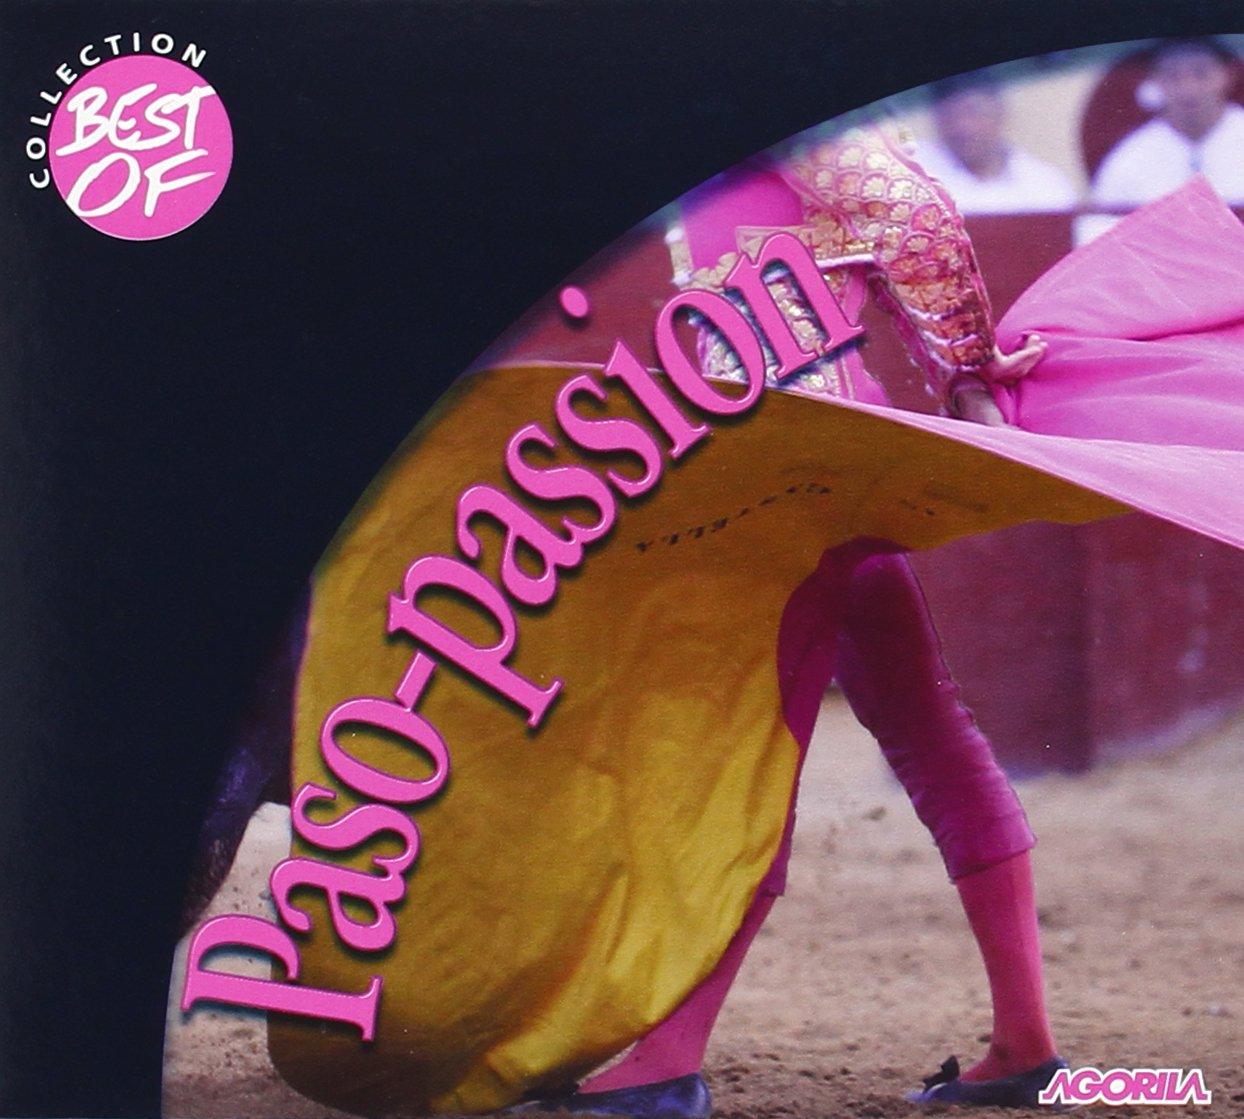 Paso - Passion: Compilation: Amazon.es: Música